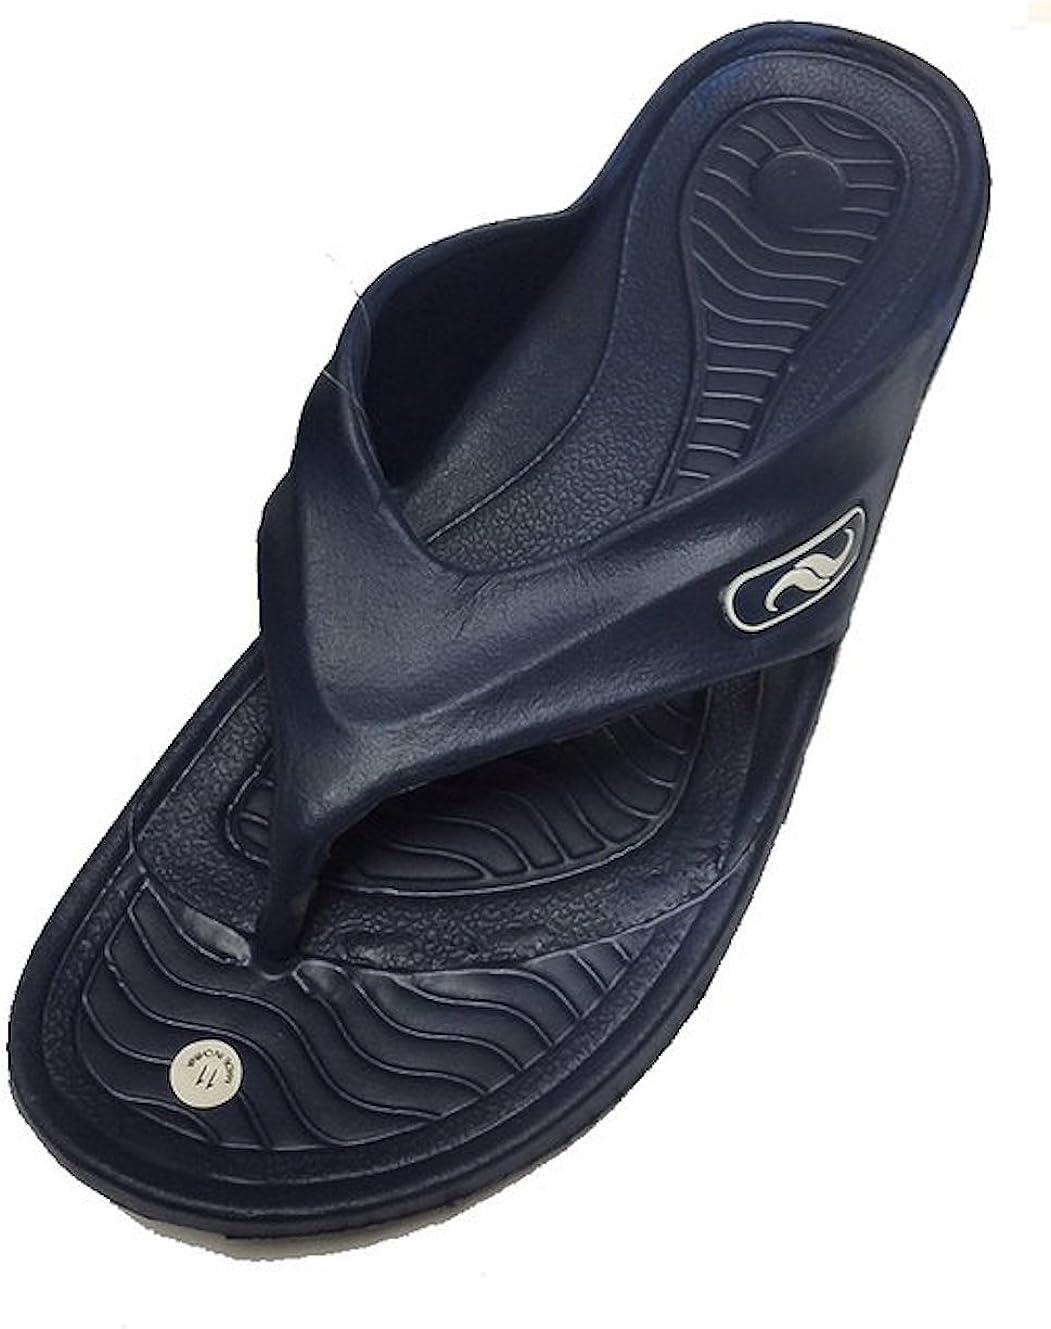 GEAR ONE Men's Rubber Sandal Comfortable Shower Beach Shoe Slip On Flip Flop (S-Blue)